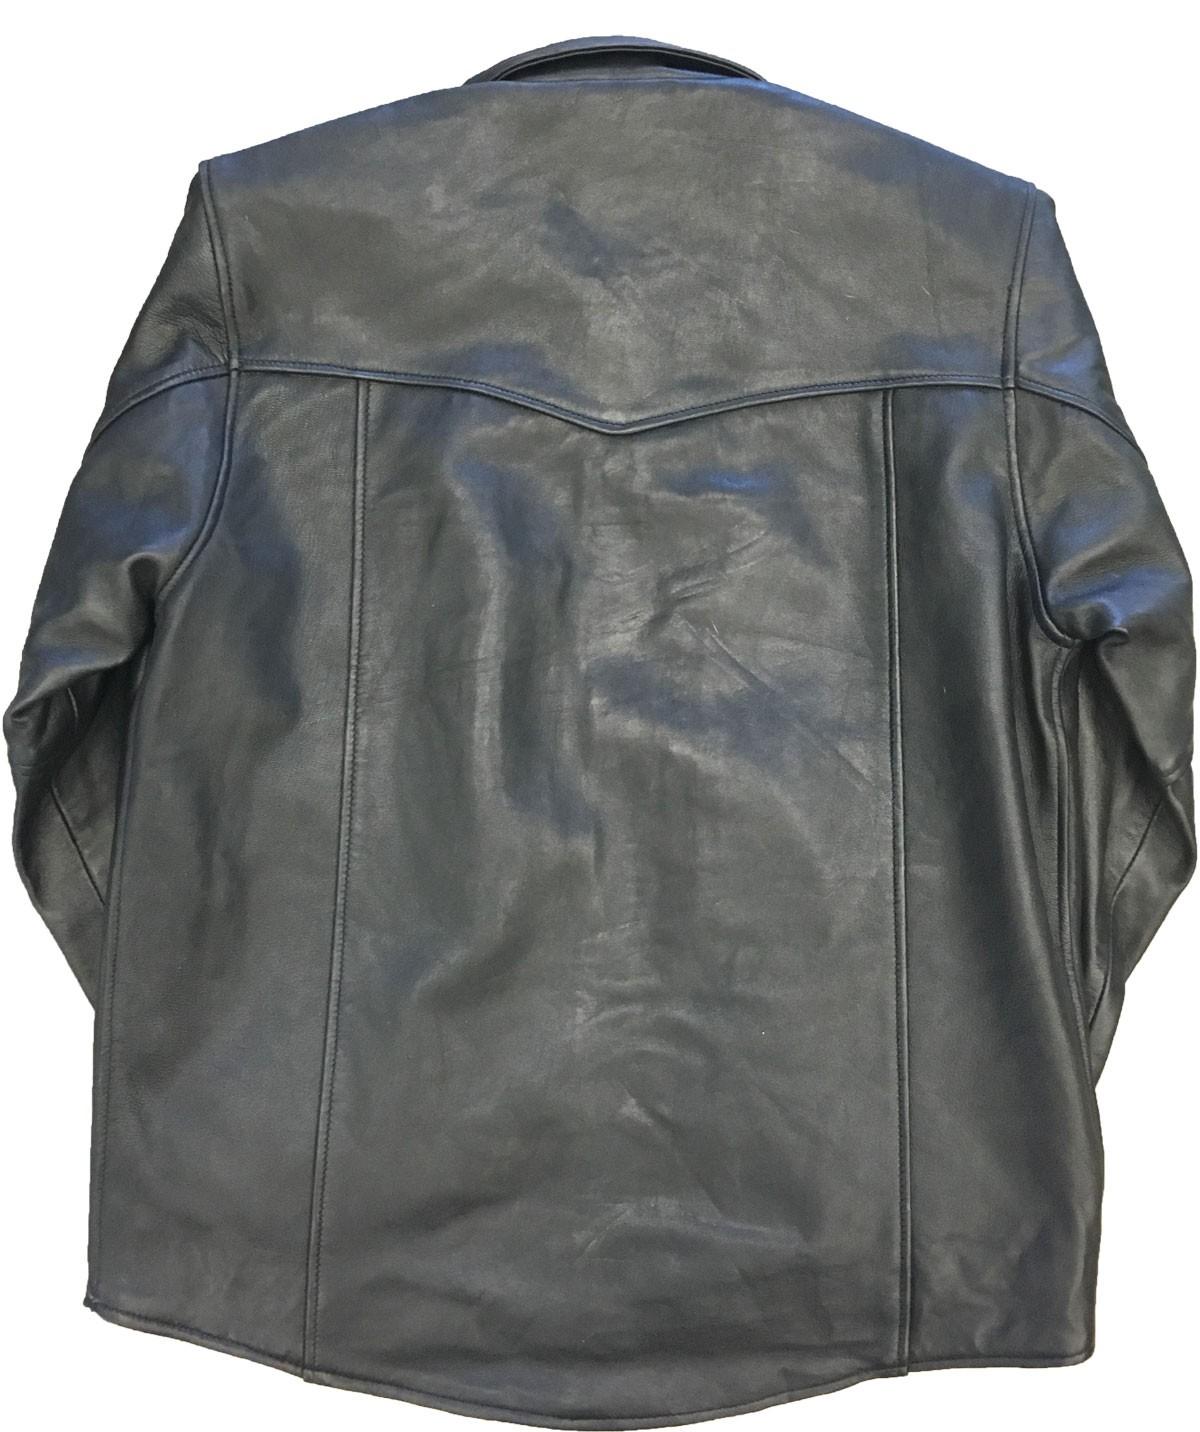 western leather shirt black jjpxcfo